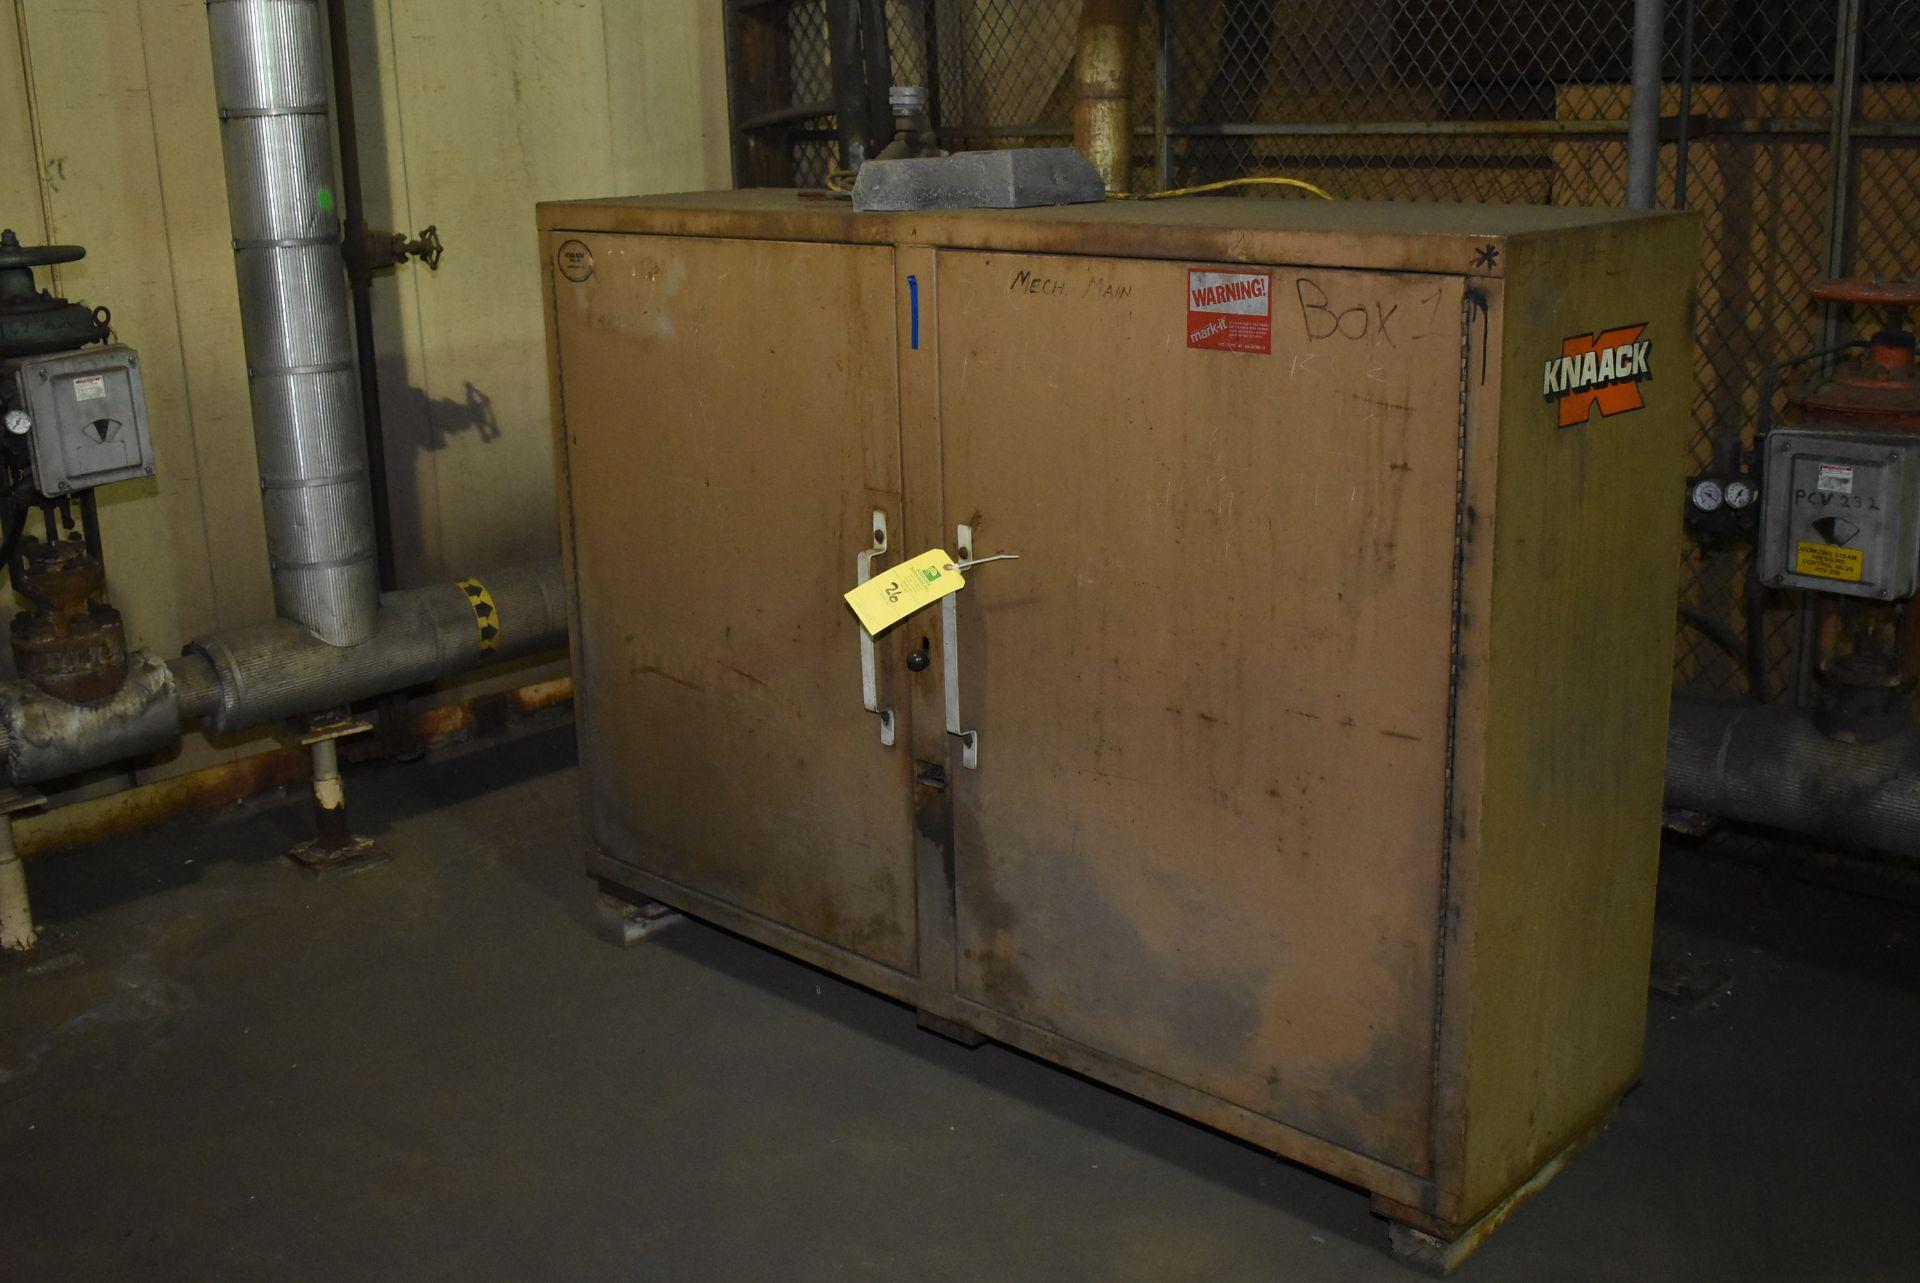 Lot 26 - Knaack Jobmaster 129 Job Box